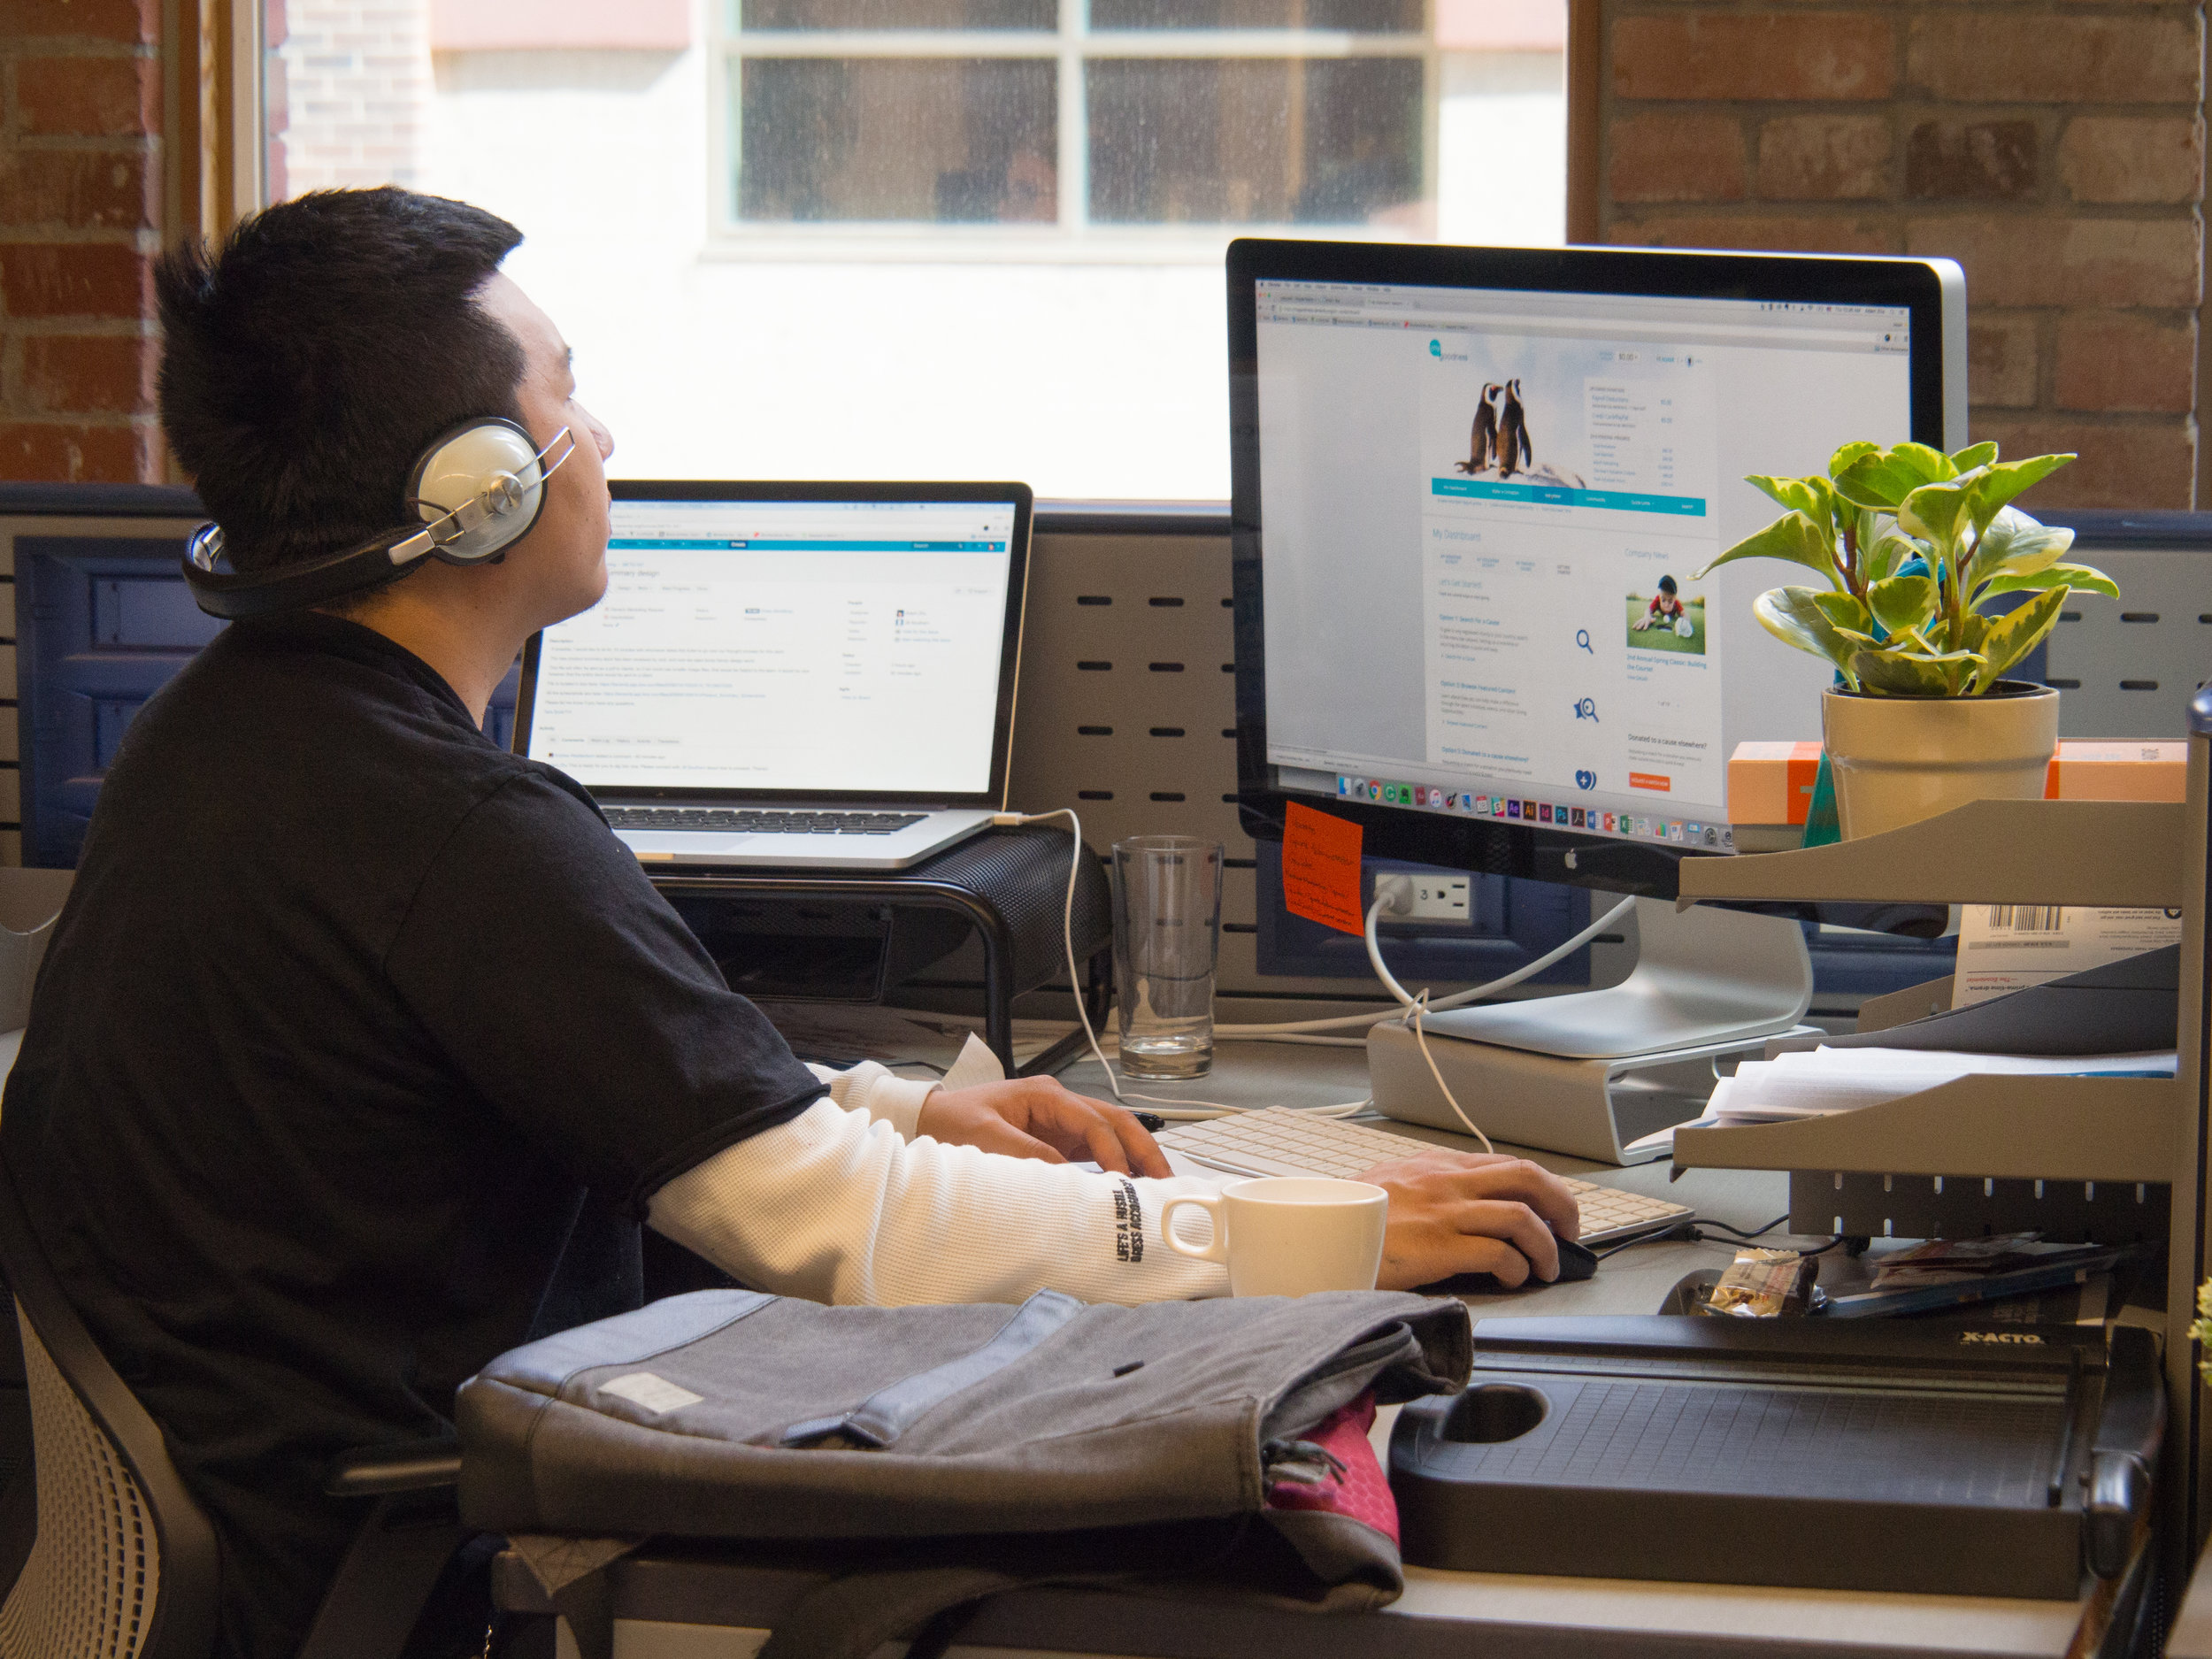 An employee explores Spark, Benevity's industry-leading Goodness platform